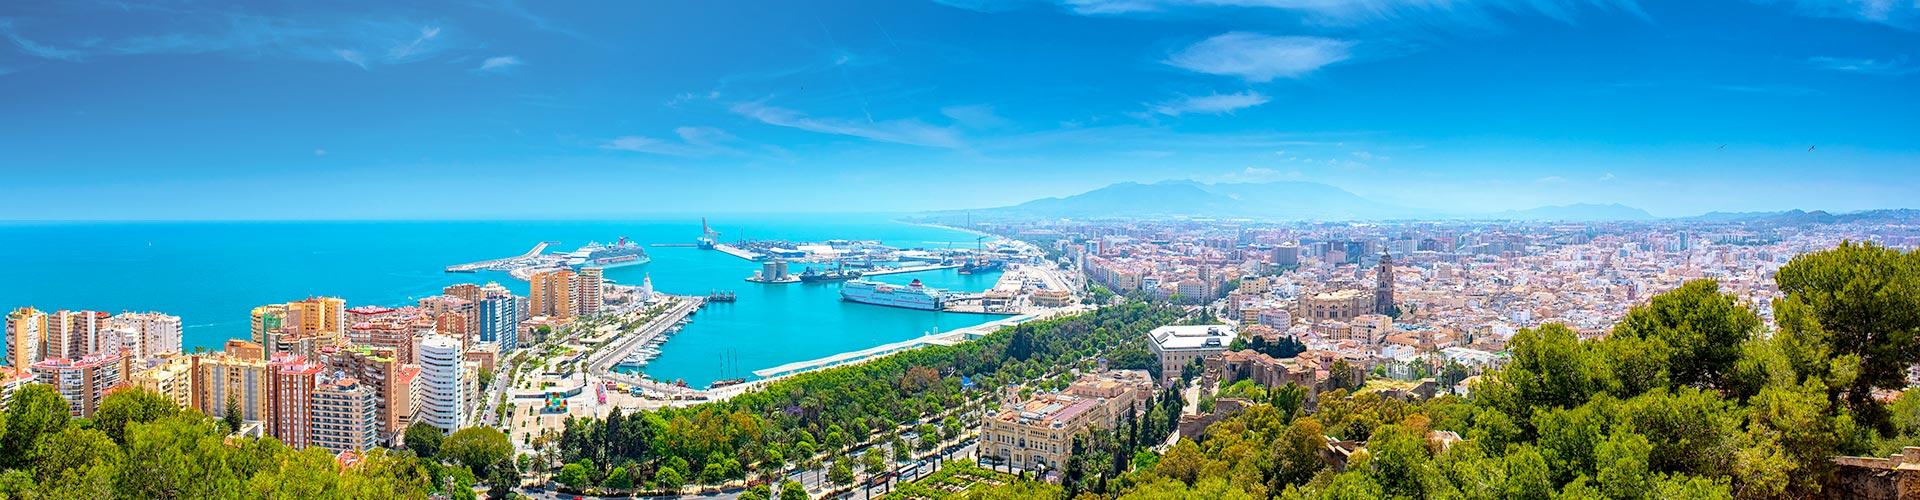 panorama view of Malaga